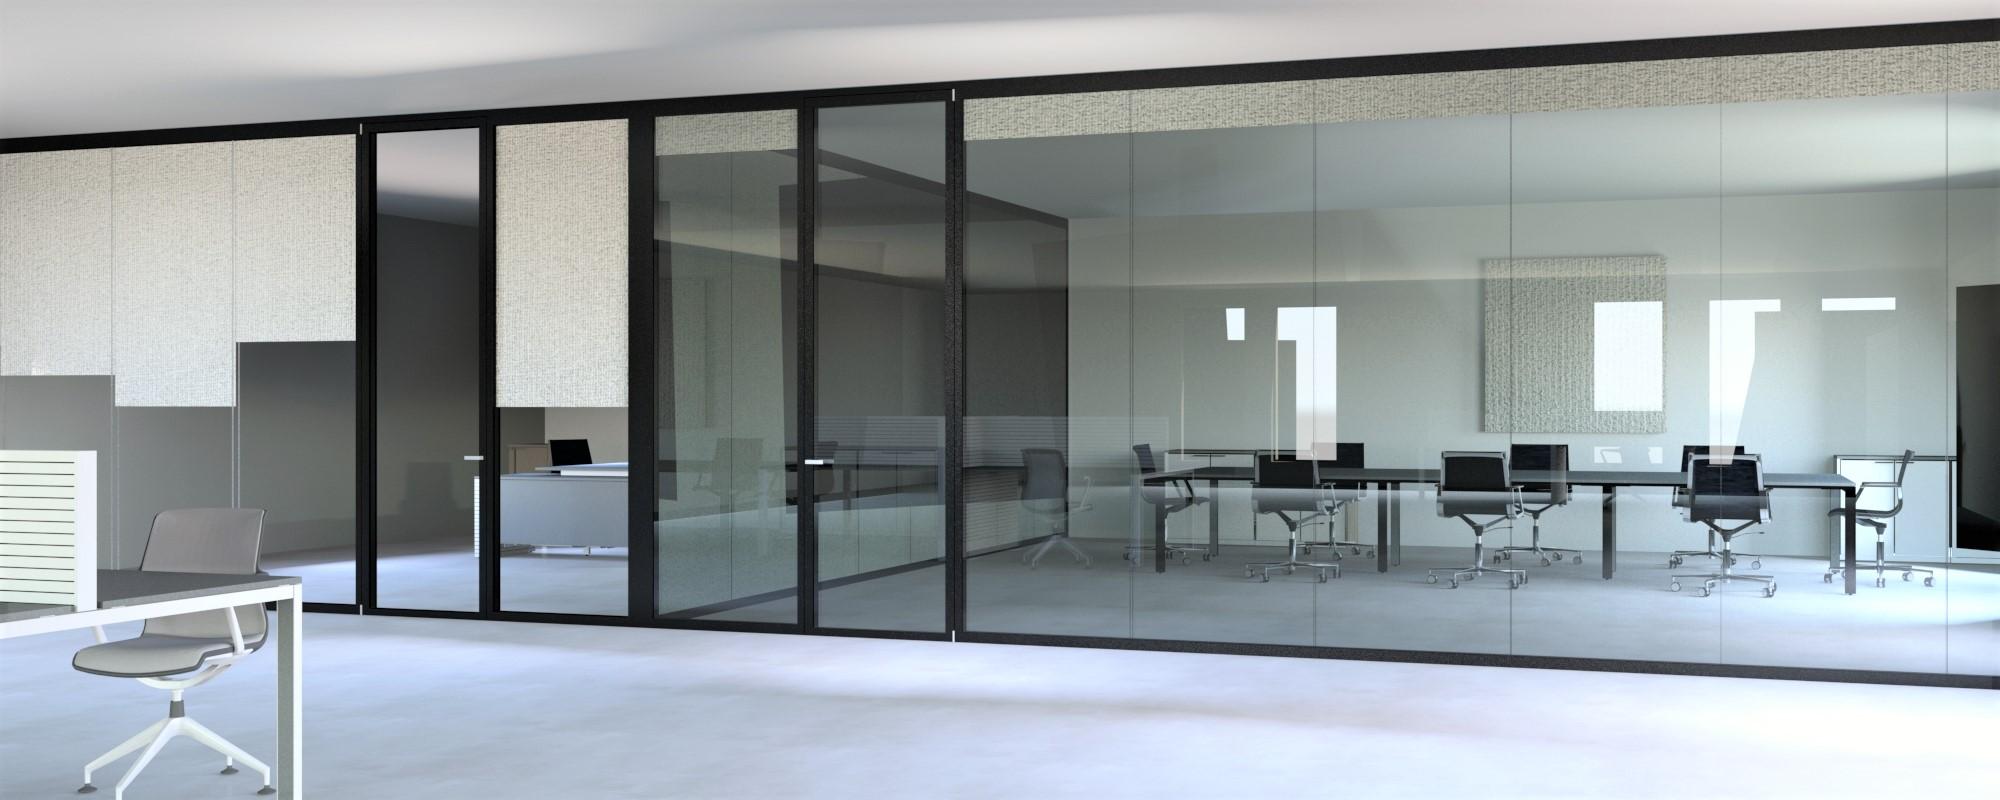 divisioni vetrate, doppio vetro